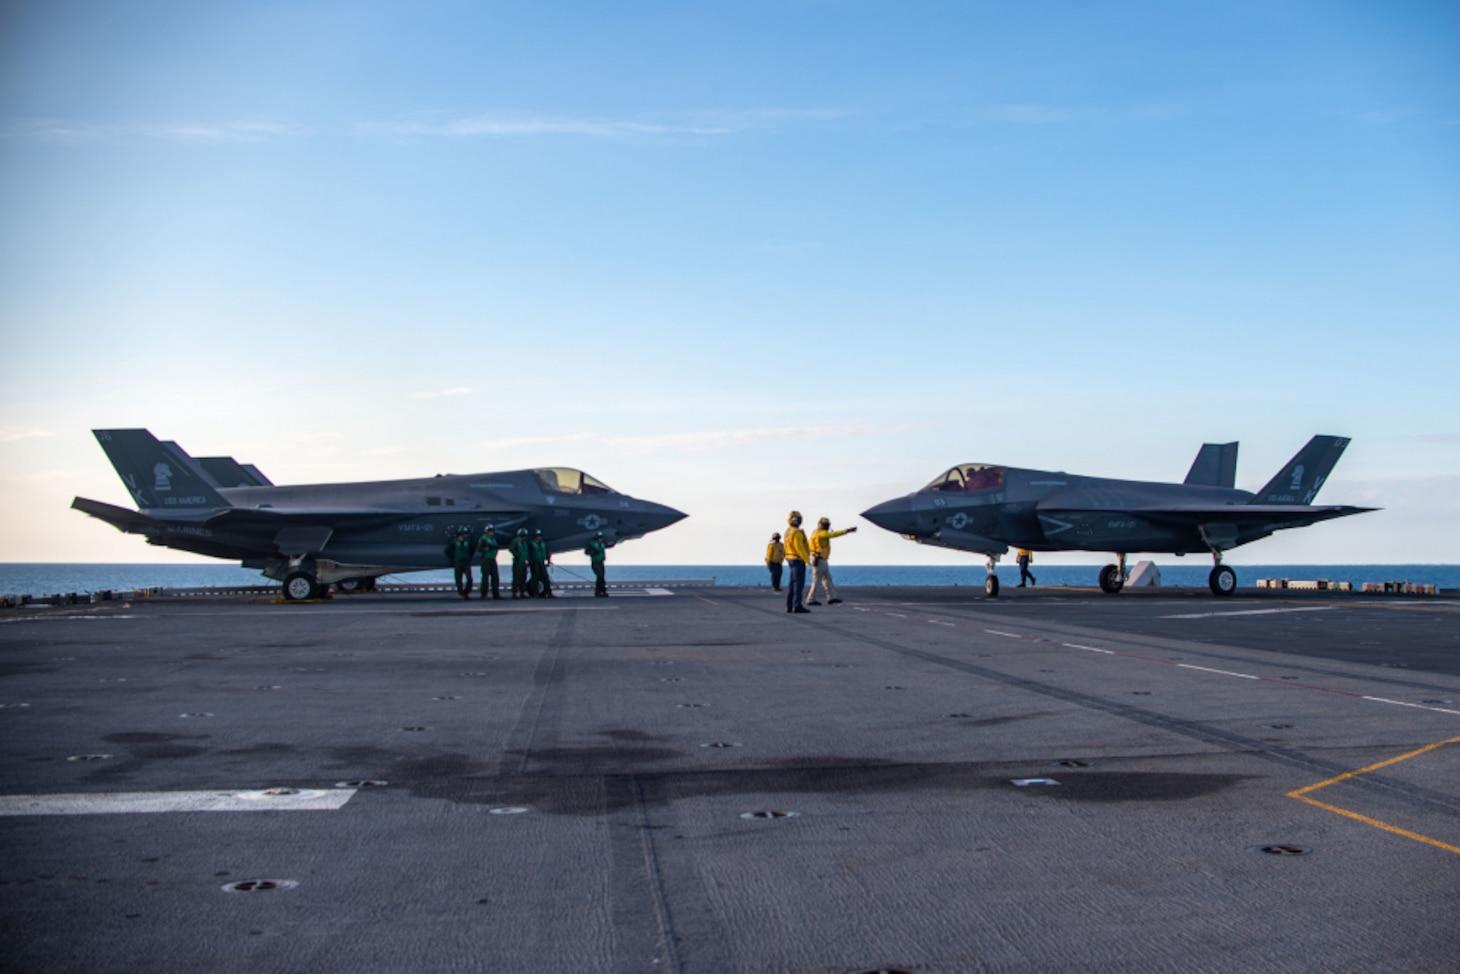 USS America (LHA 6) Conducts Flight Operations